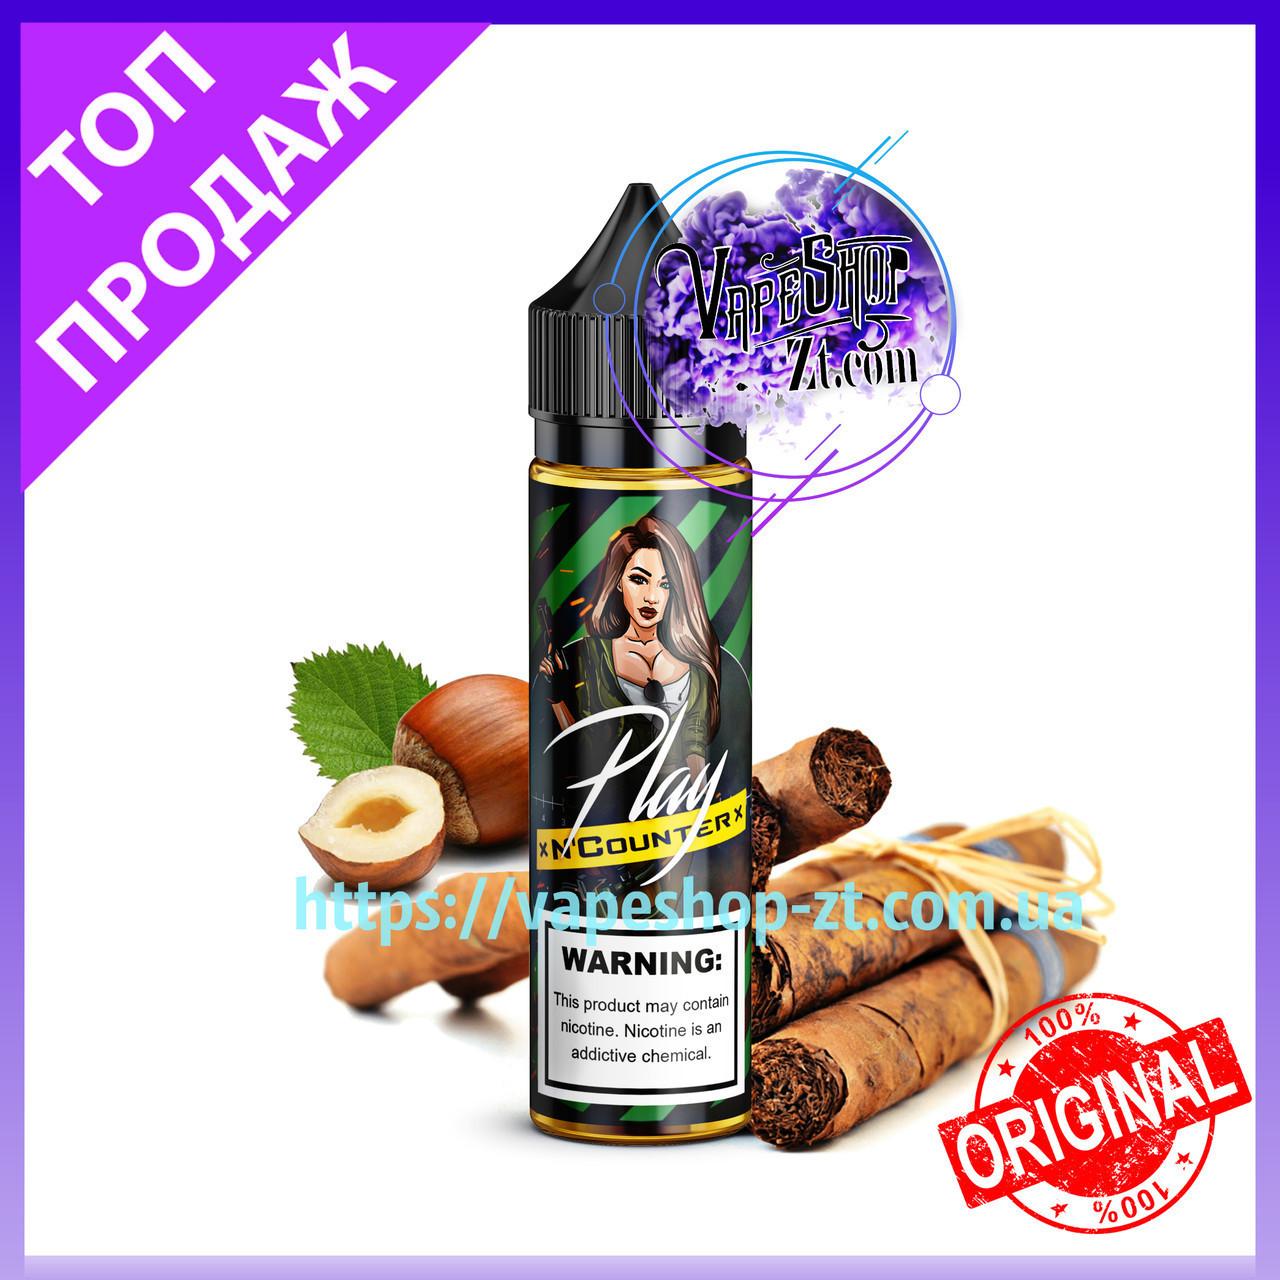 Жидкость для электронных сигарет Play N Counter GREEN 60 мл. Заправка для сигарет табачная play (Табачка)